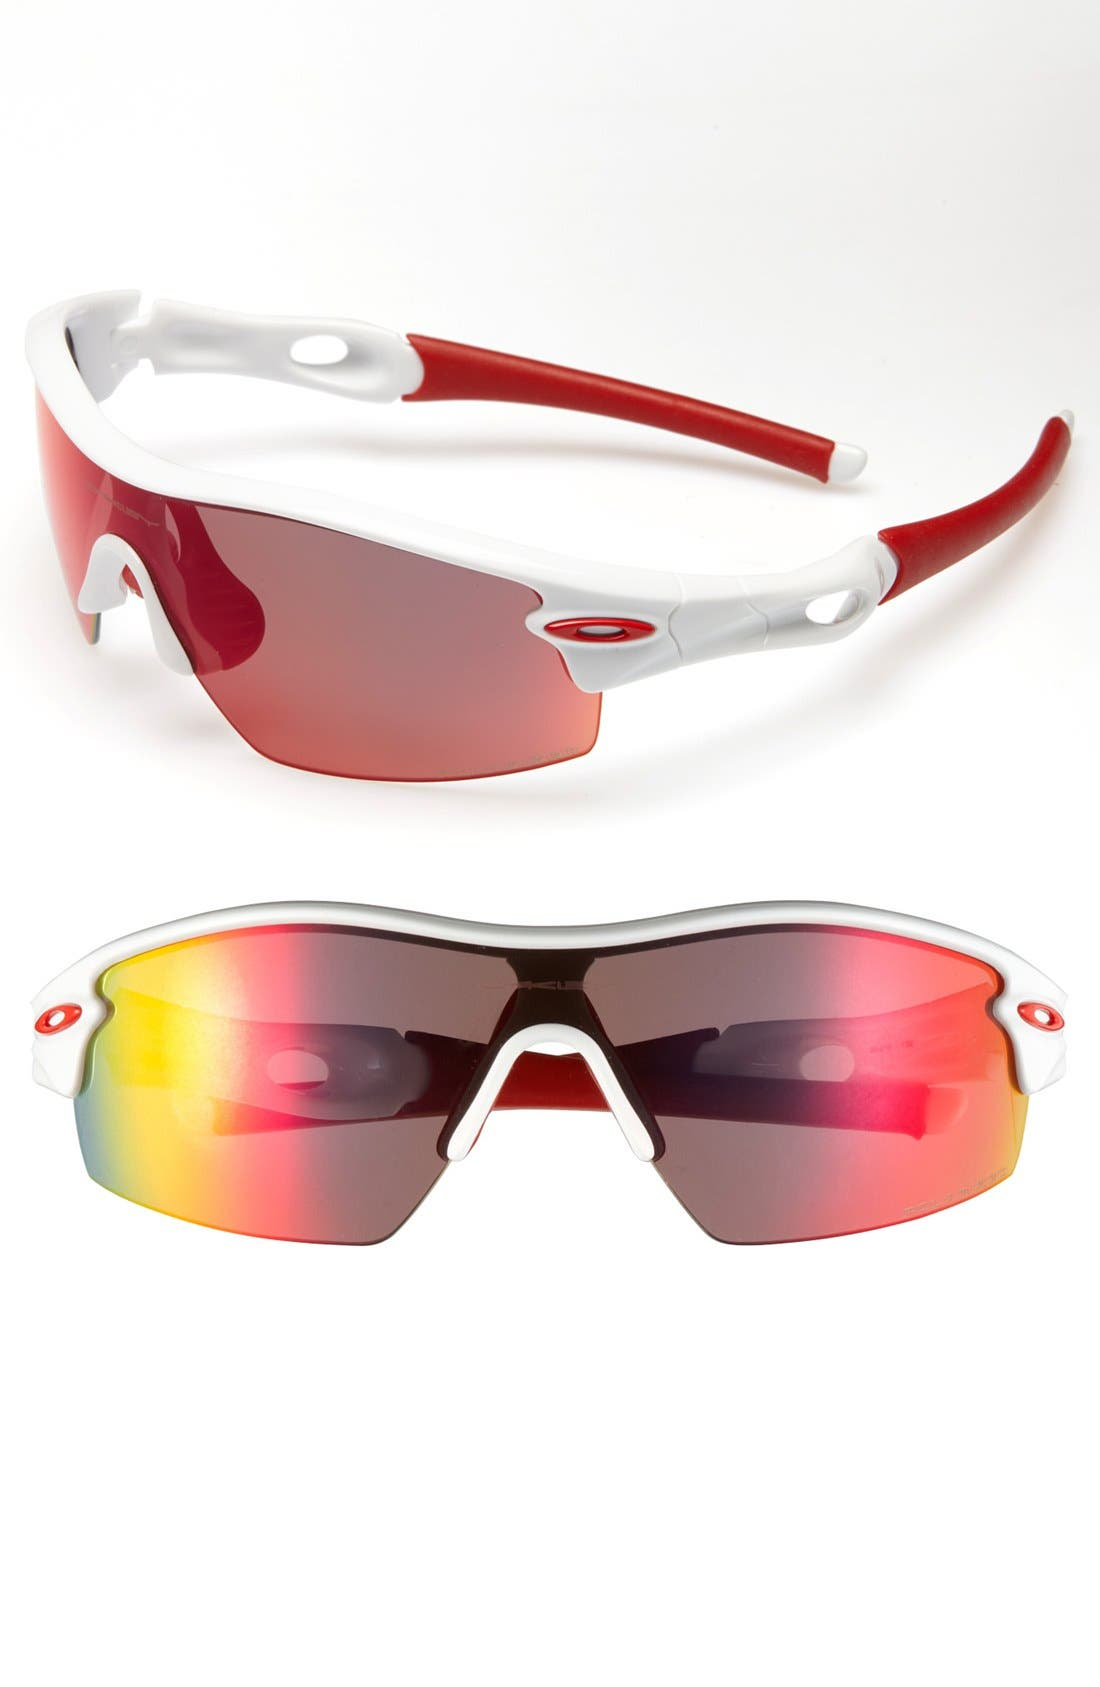 Main Image - Oakley 'Radar Pitch' Polarized Sunglasses